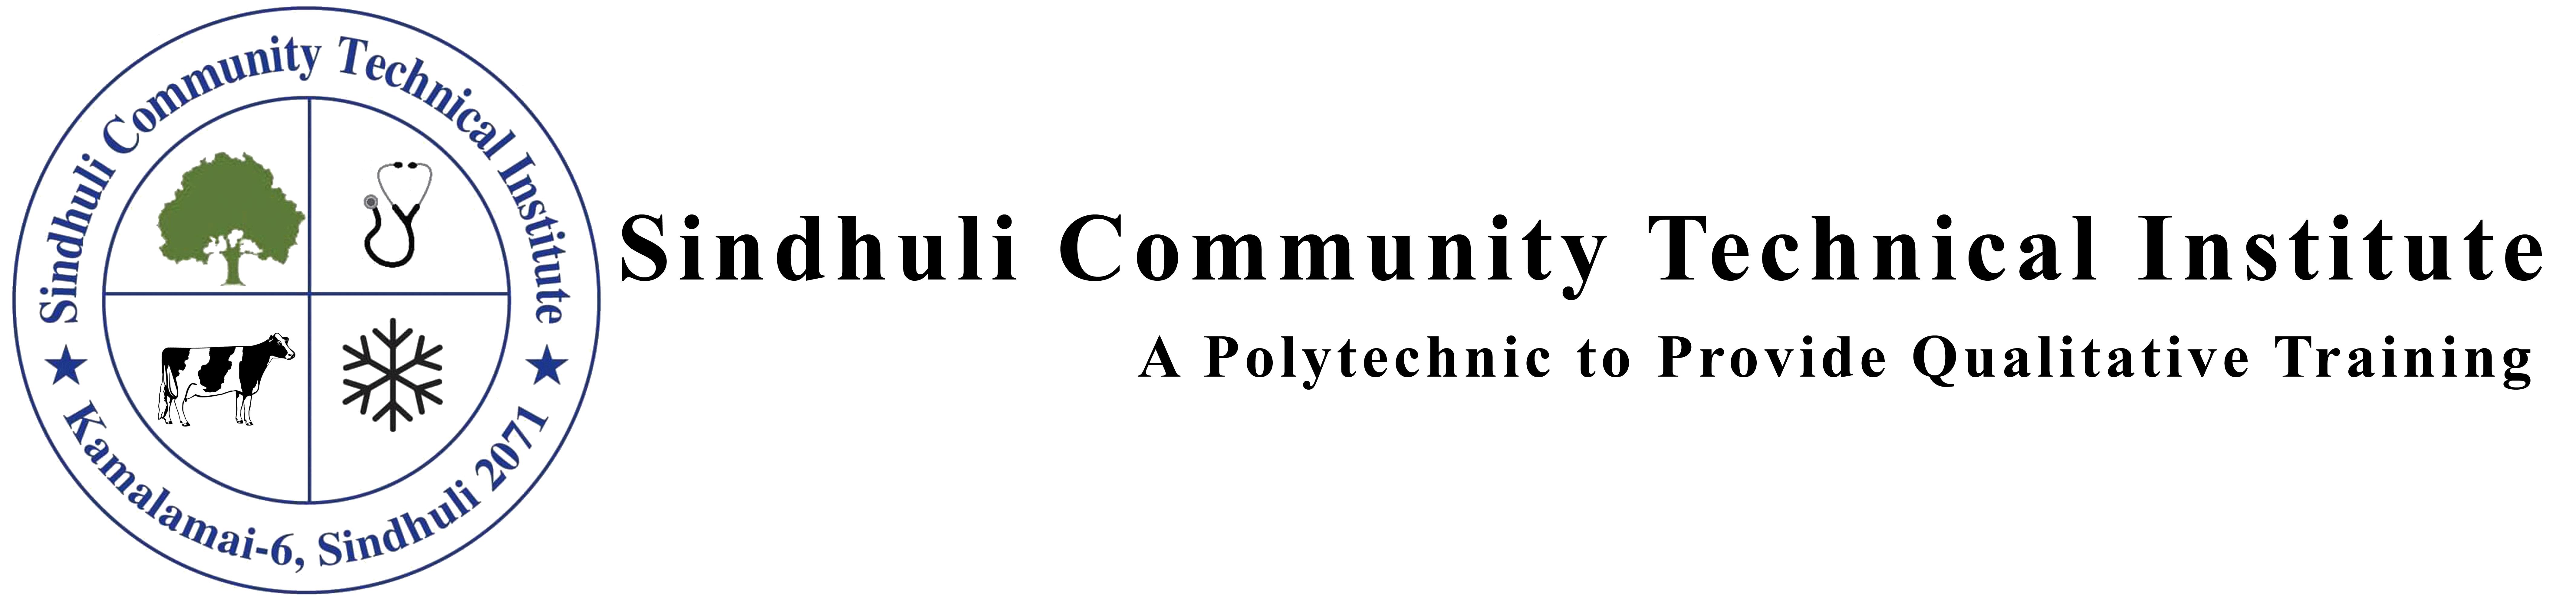 Sindhuli Community Technical Institute -